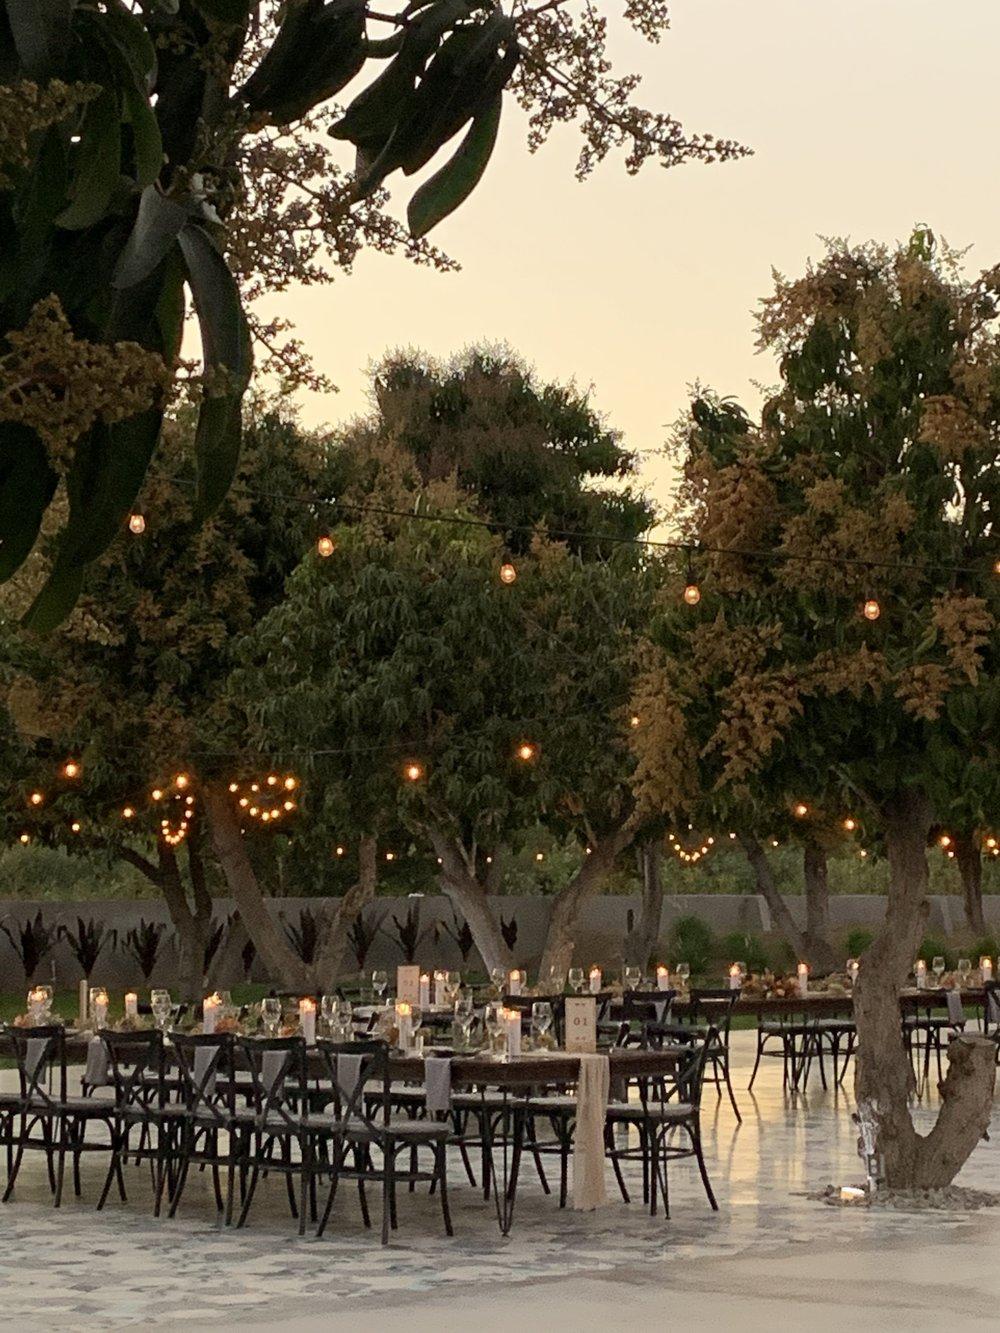 The wedding reception @acrebaja.